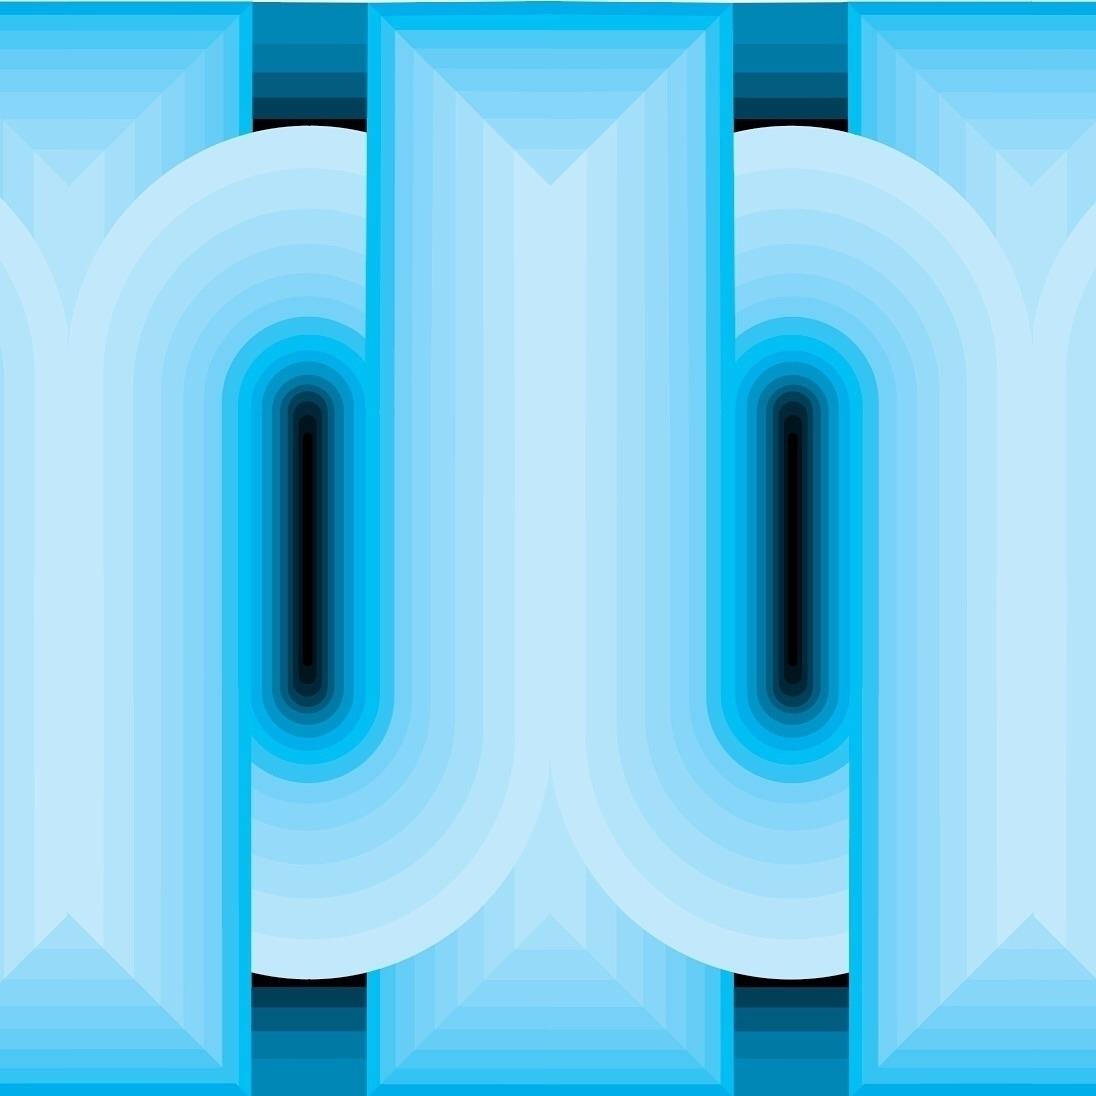 E8D08843-4214-48E1-9FDD-9B2285AEB589.jpg